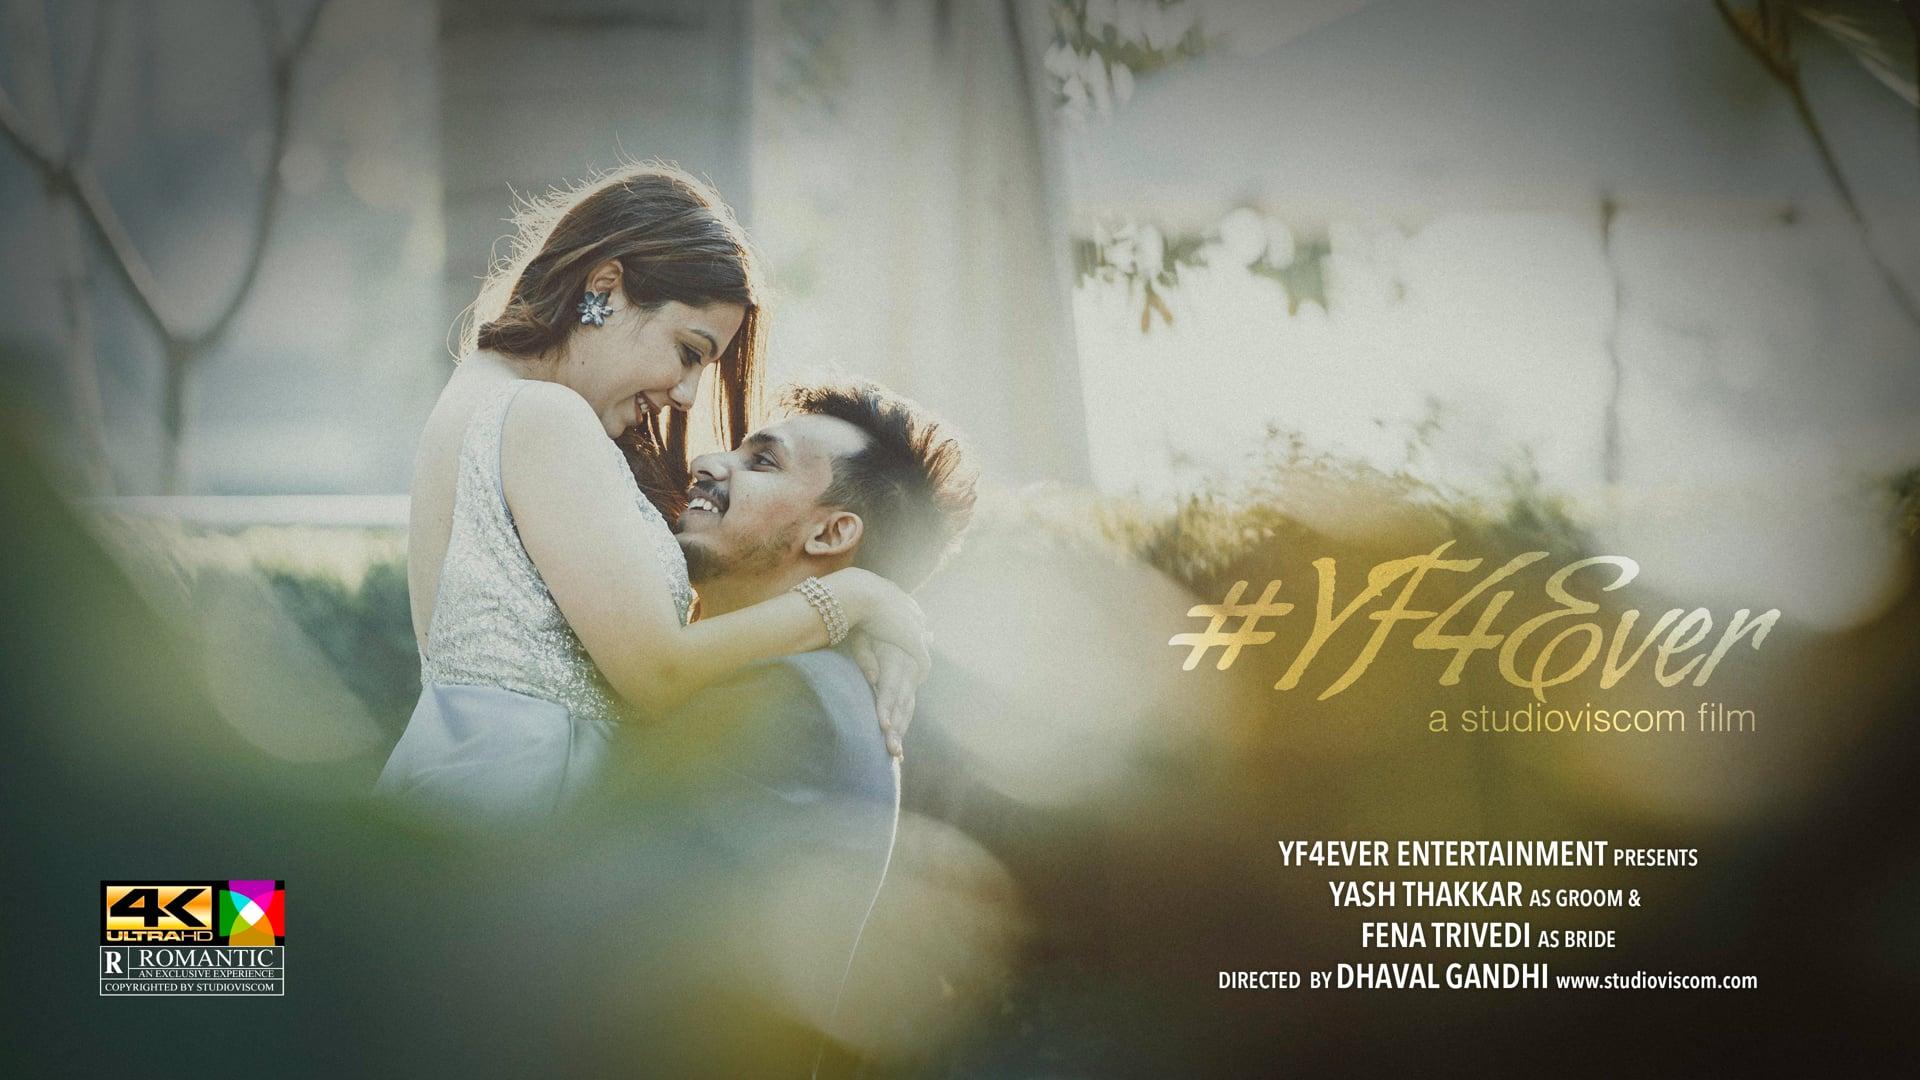 Fena & Yash Wedding Coming Soon